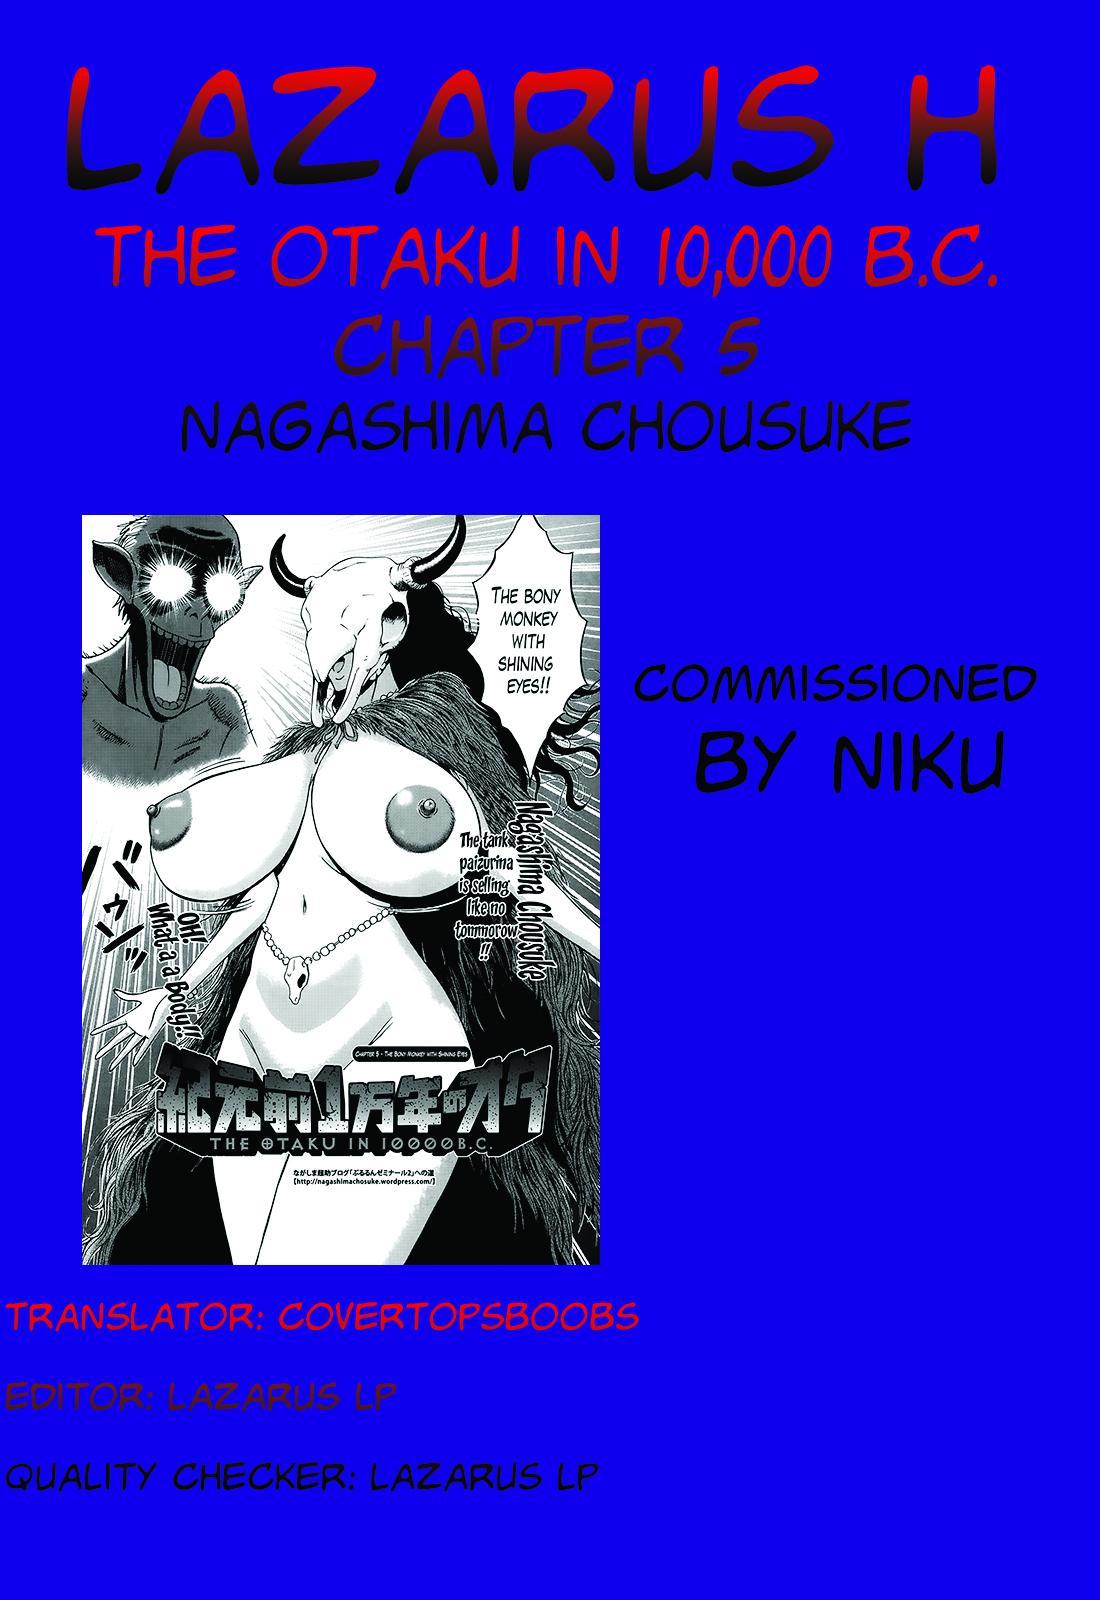 Kigenzen 10000 Nen no Ota | The Otaku in 10,000 B.C. 98